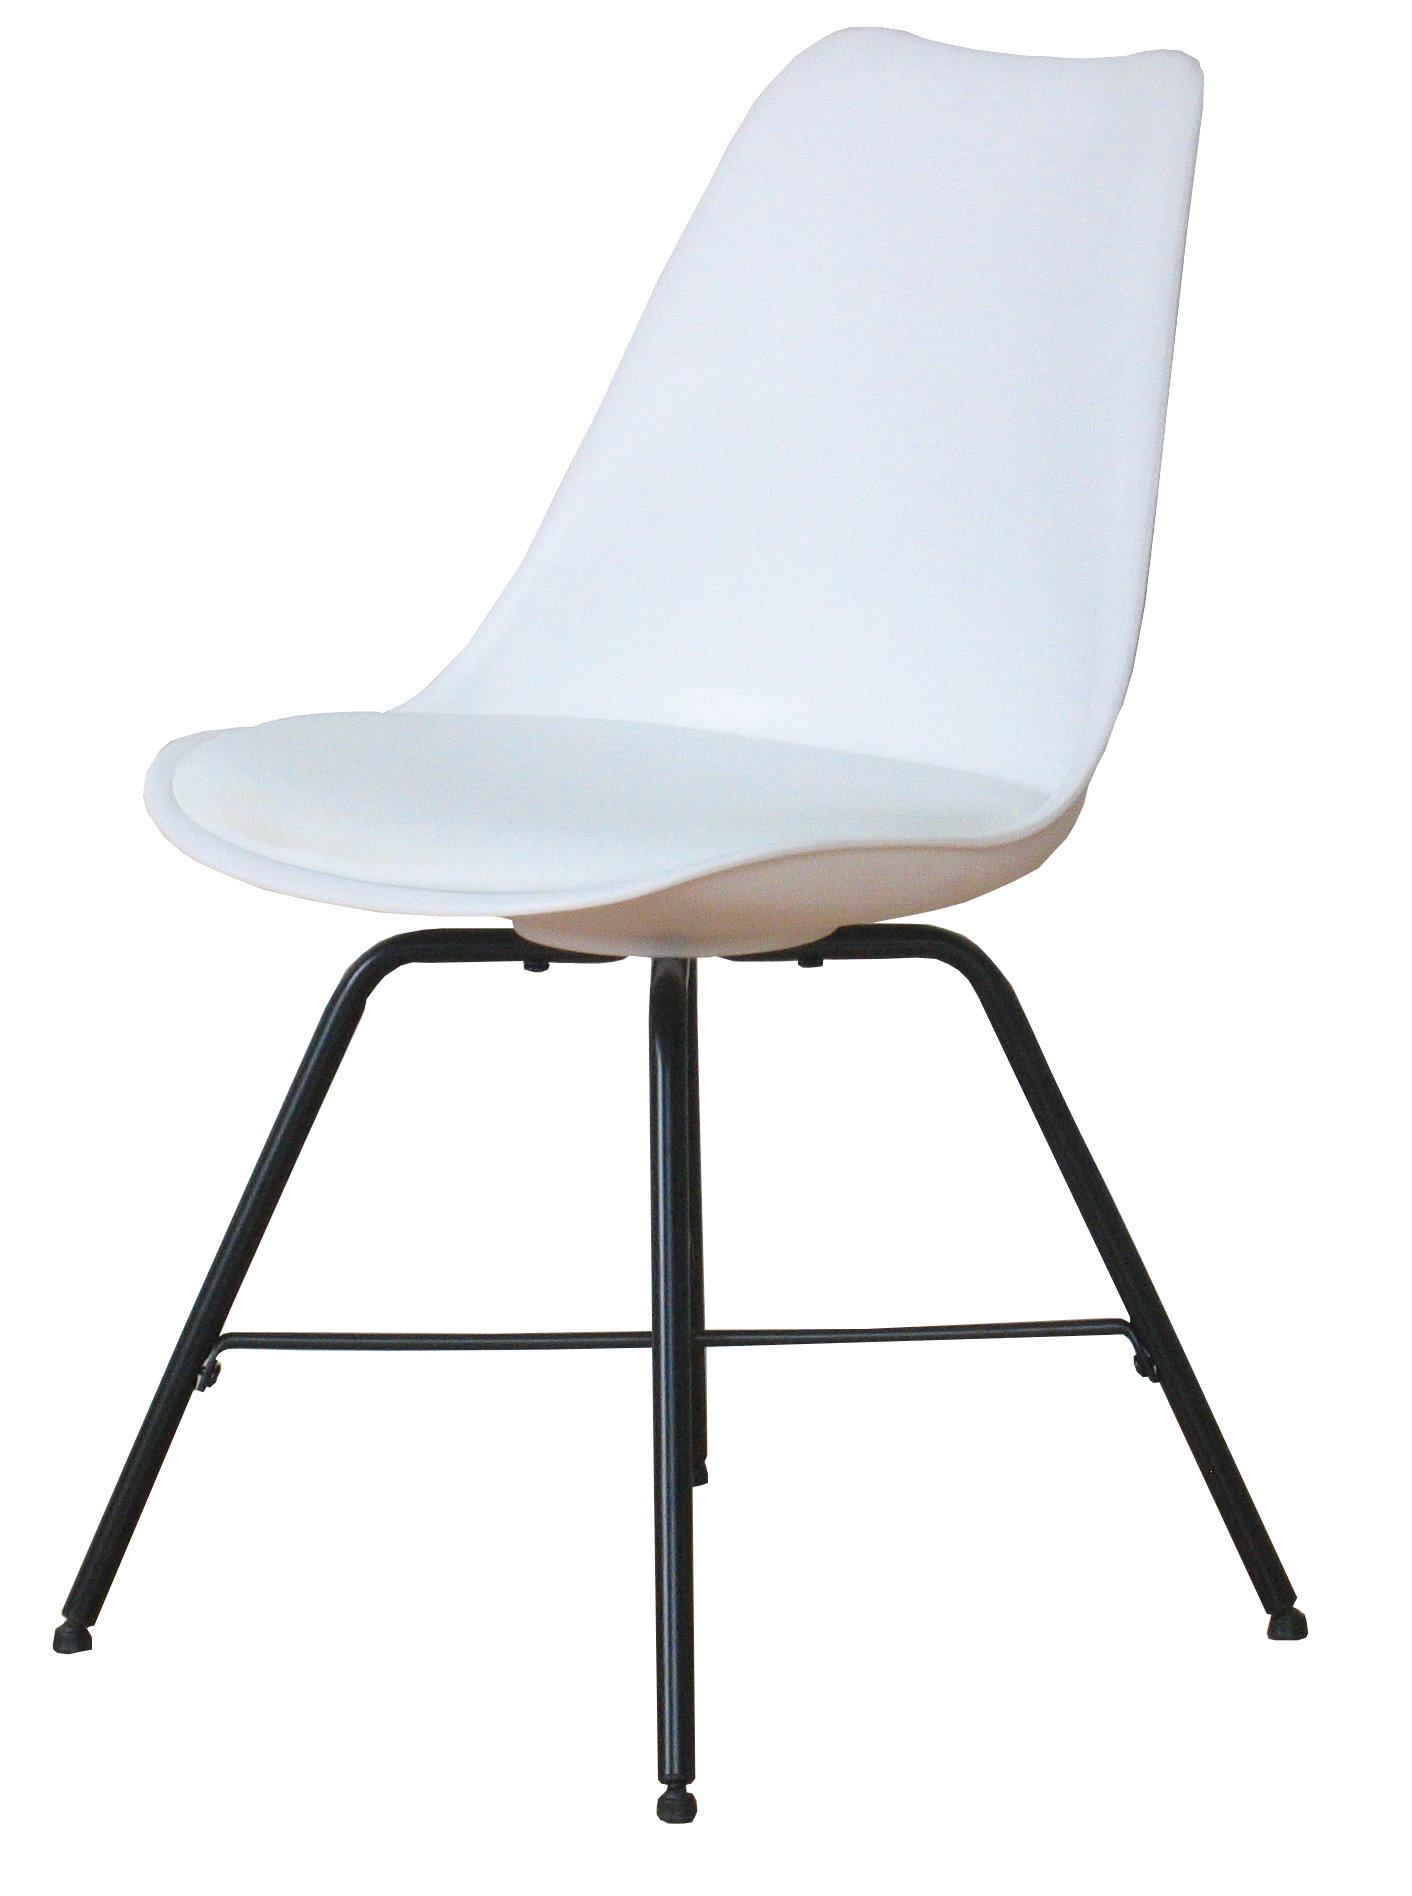 4 x esszimmerst hle niko retro stuhl sitz gruppe wei ebay. Black Bedroom Furniture Sets. Home Design Ideas